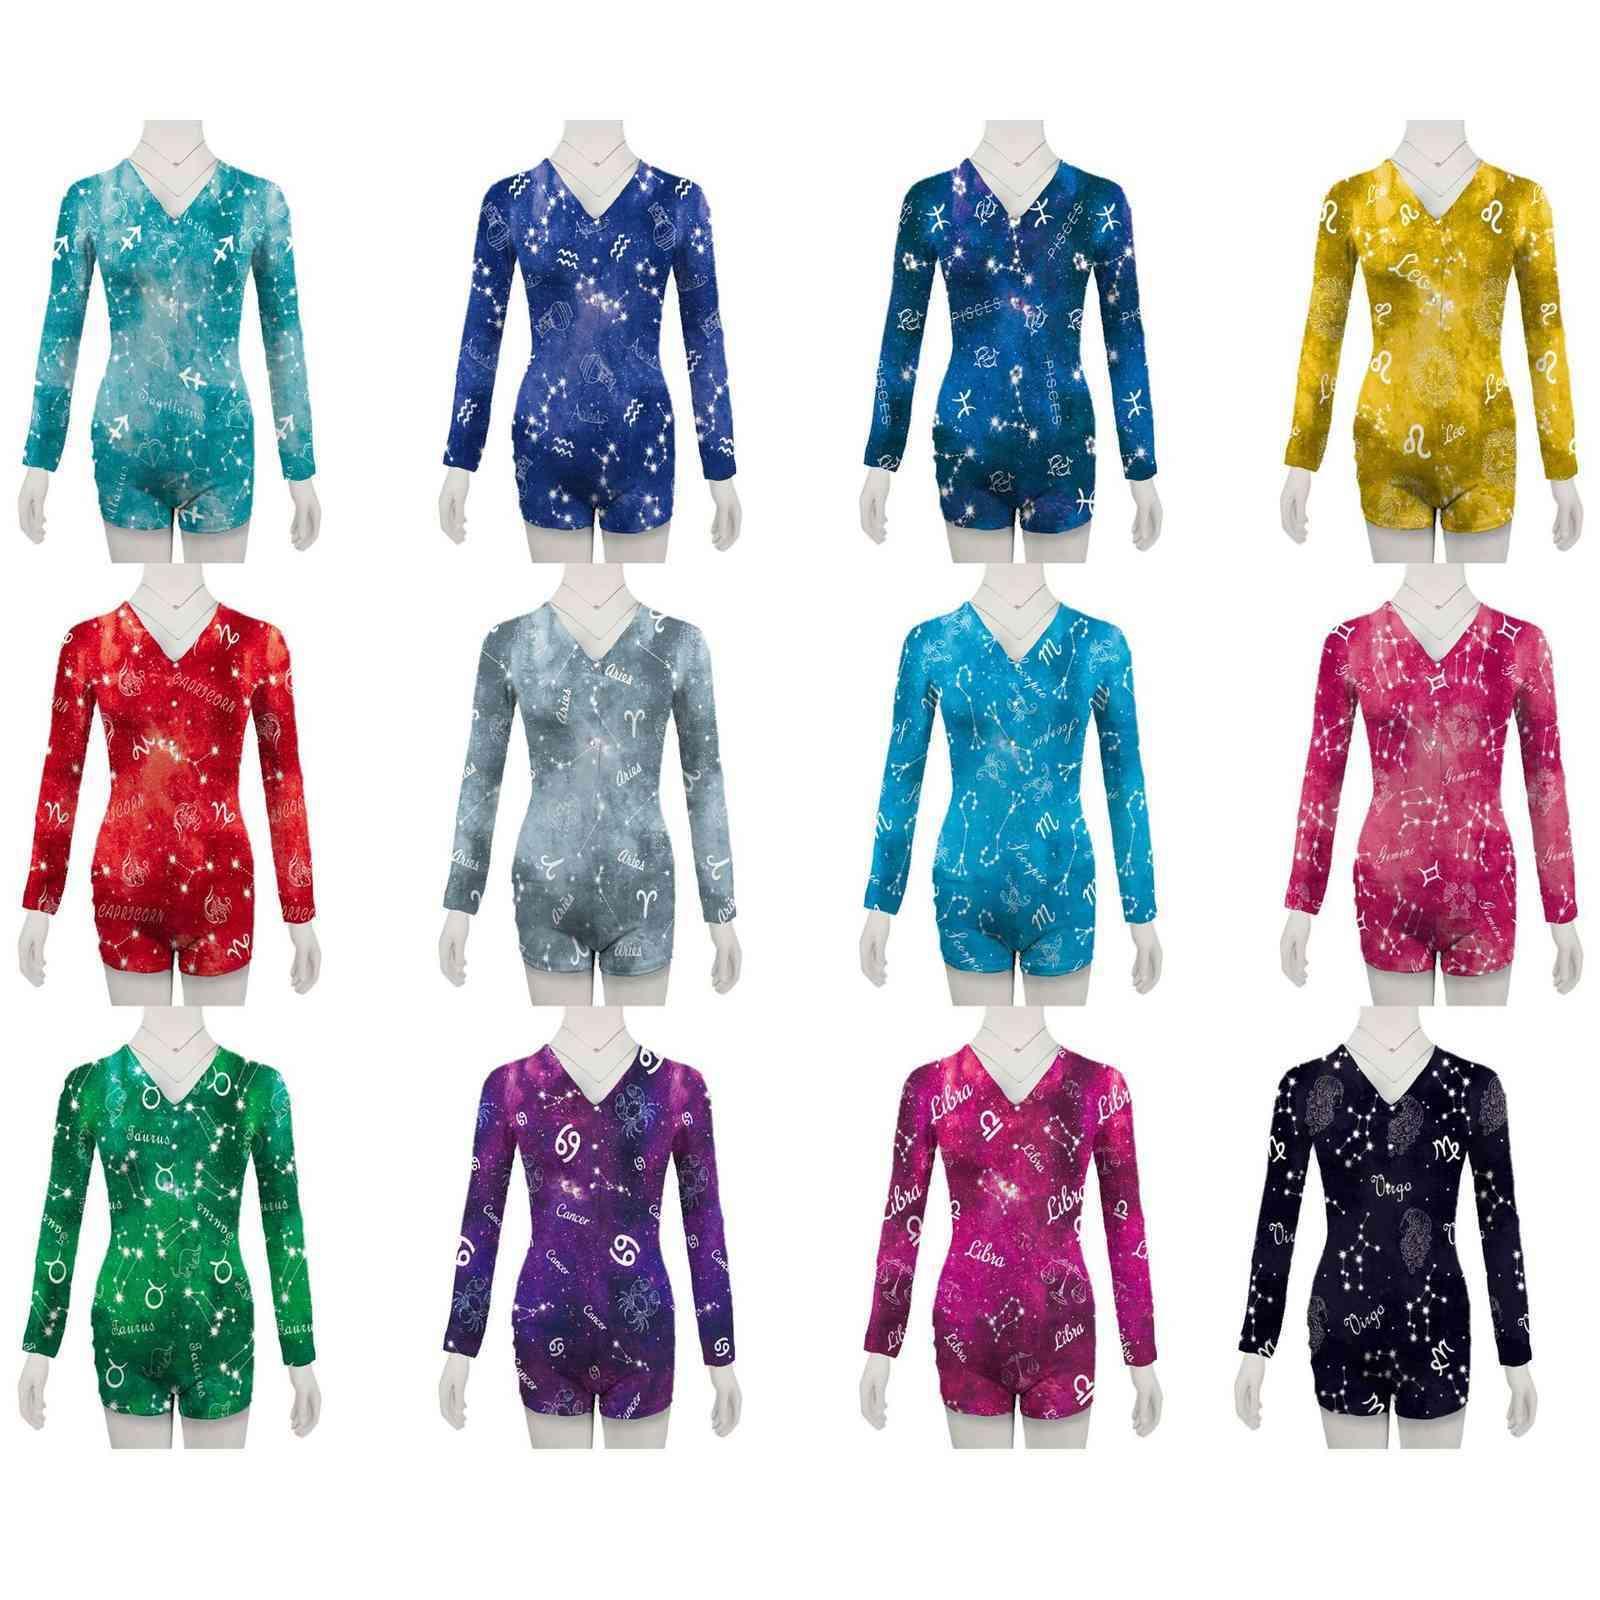 Designer Women Jumpsuit Rompers 12 constellations Print Long Sleeve pajamas deep V nightclub tights M8877